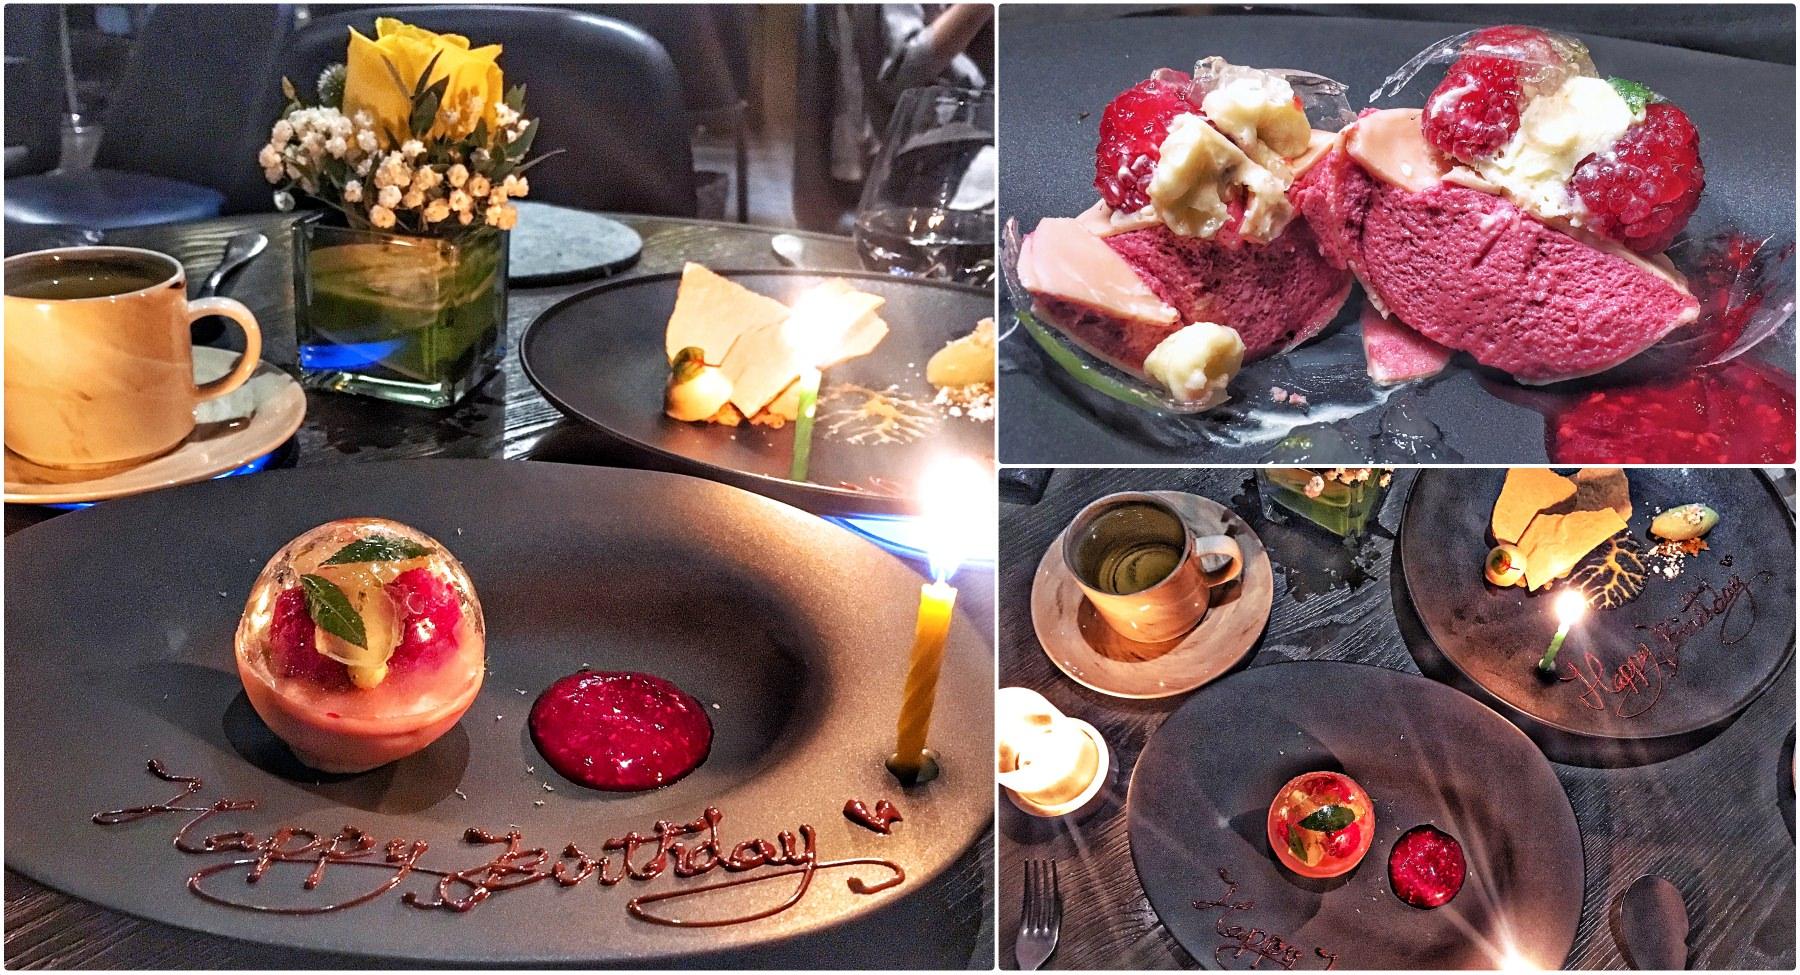 Orchid Restaurant 蘭餐廳♥擁有東方靈魂的法式料理  3訪推薦秋季新菜單! 牛排 情人節求婚生日餐(信義區/捷運信義安和站)♥ JoyceWu。食尚樂活。食記